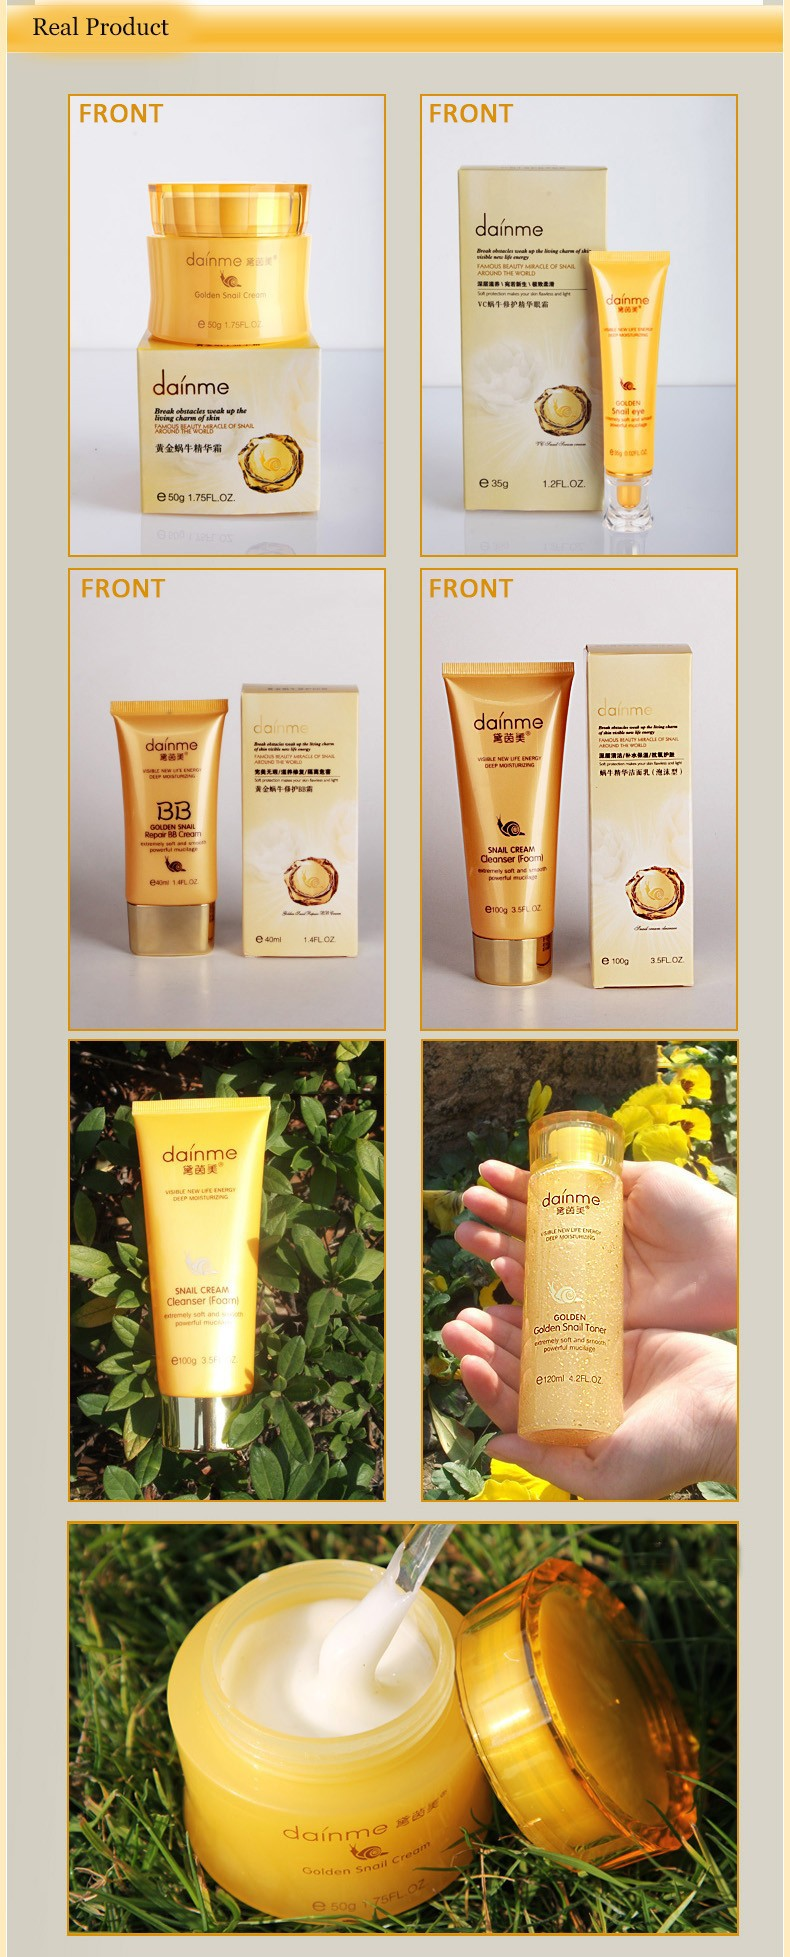 DAINMEI 24K Gold Snail Skin Care Set & Essence Cream Eye Cream BB Creams Toner Facial Cleanser& 5pcs Face care Set 5